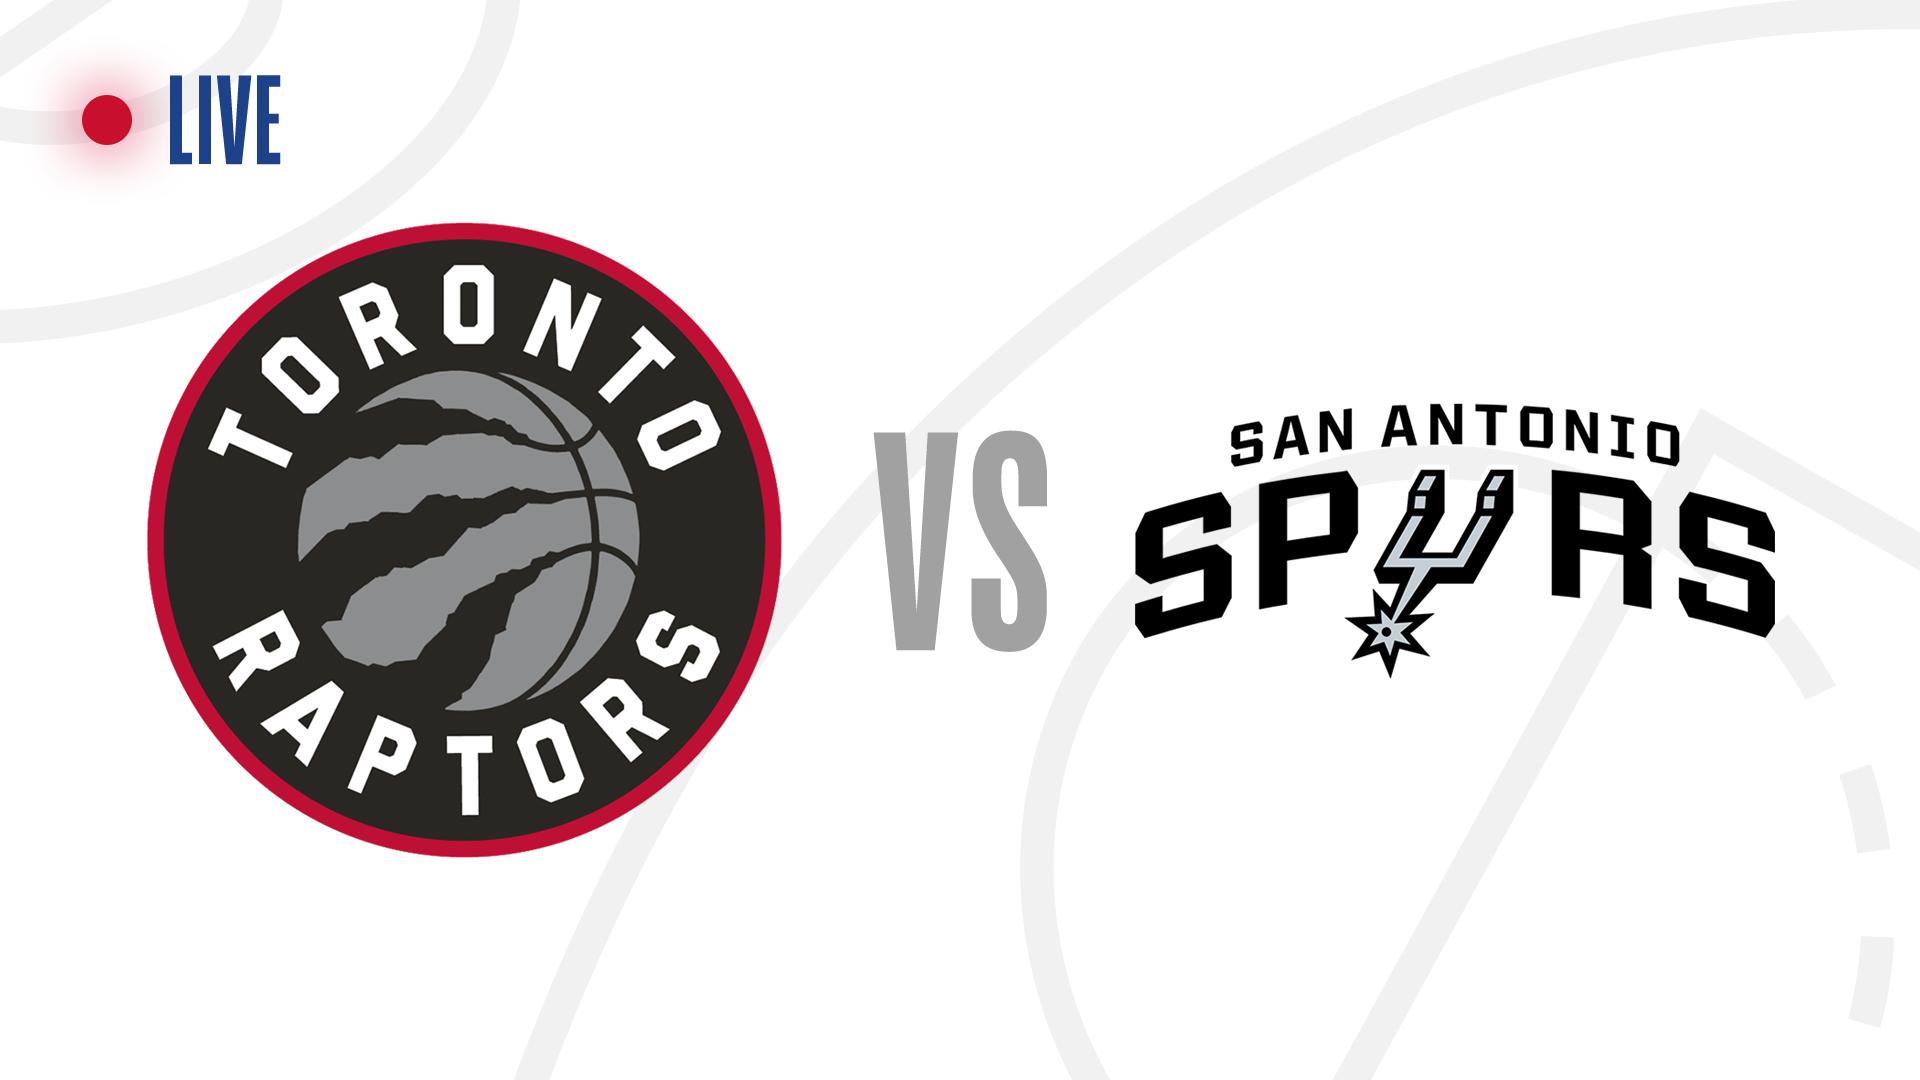 Toronto Raptors Vs San Antonio Spurs Live Score Updates